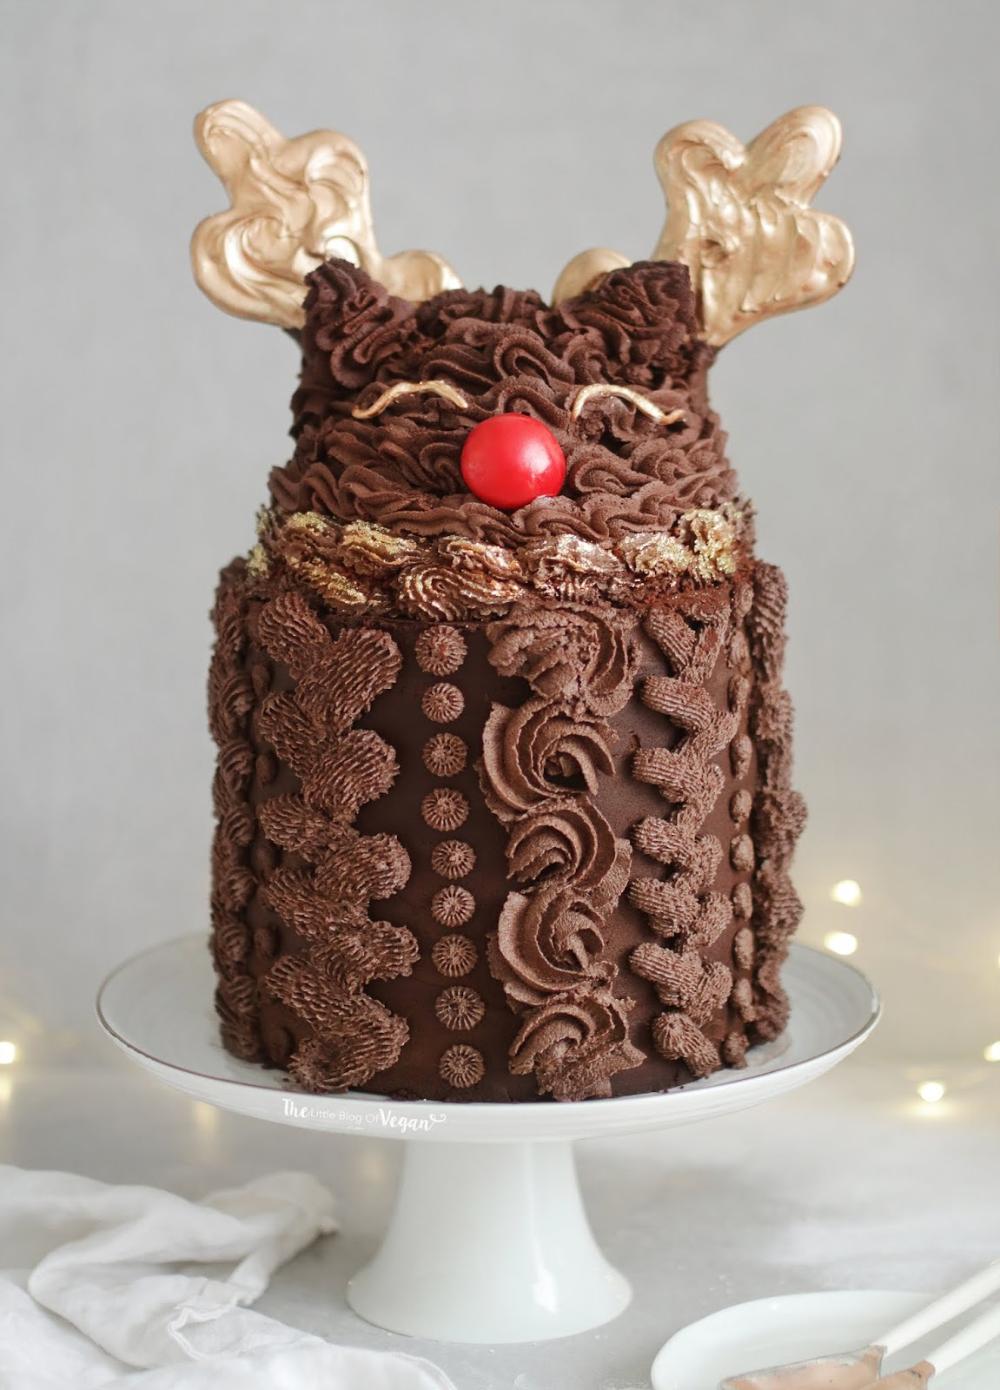 Chocolate ganache reindeer cake in 2020 Reindeer cakes